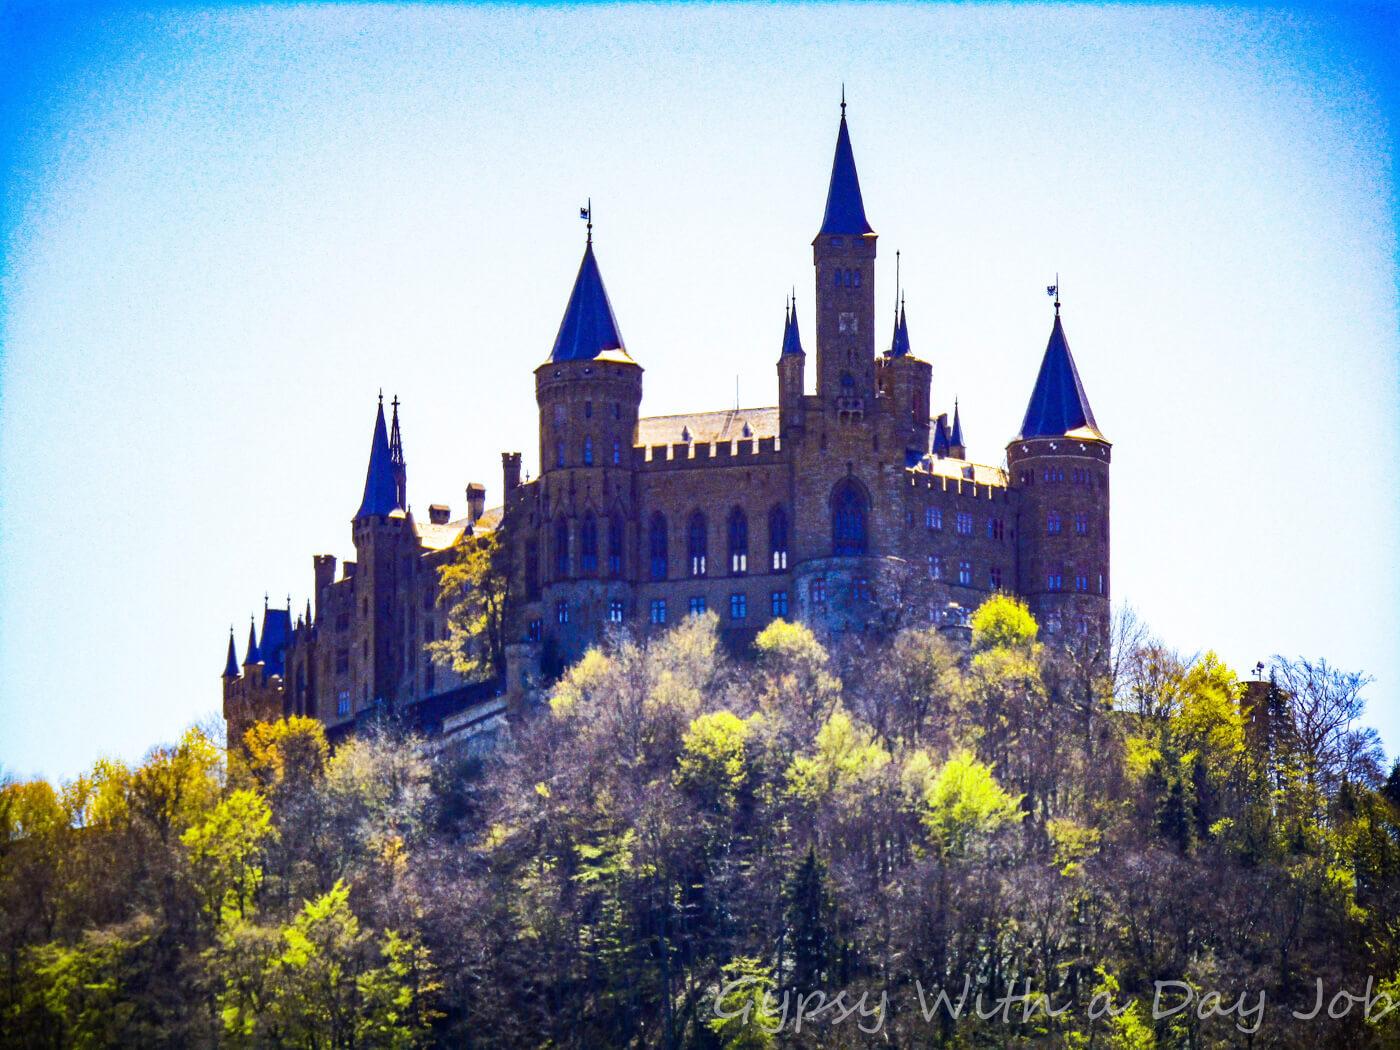 Hohenzollern Castle Burg Hohenzollern Gypsy With A Day Job